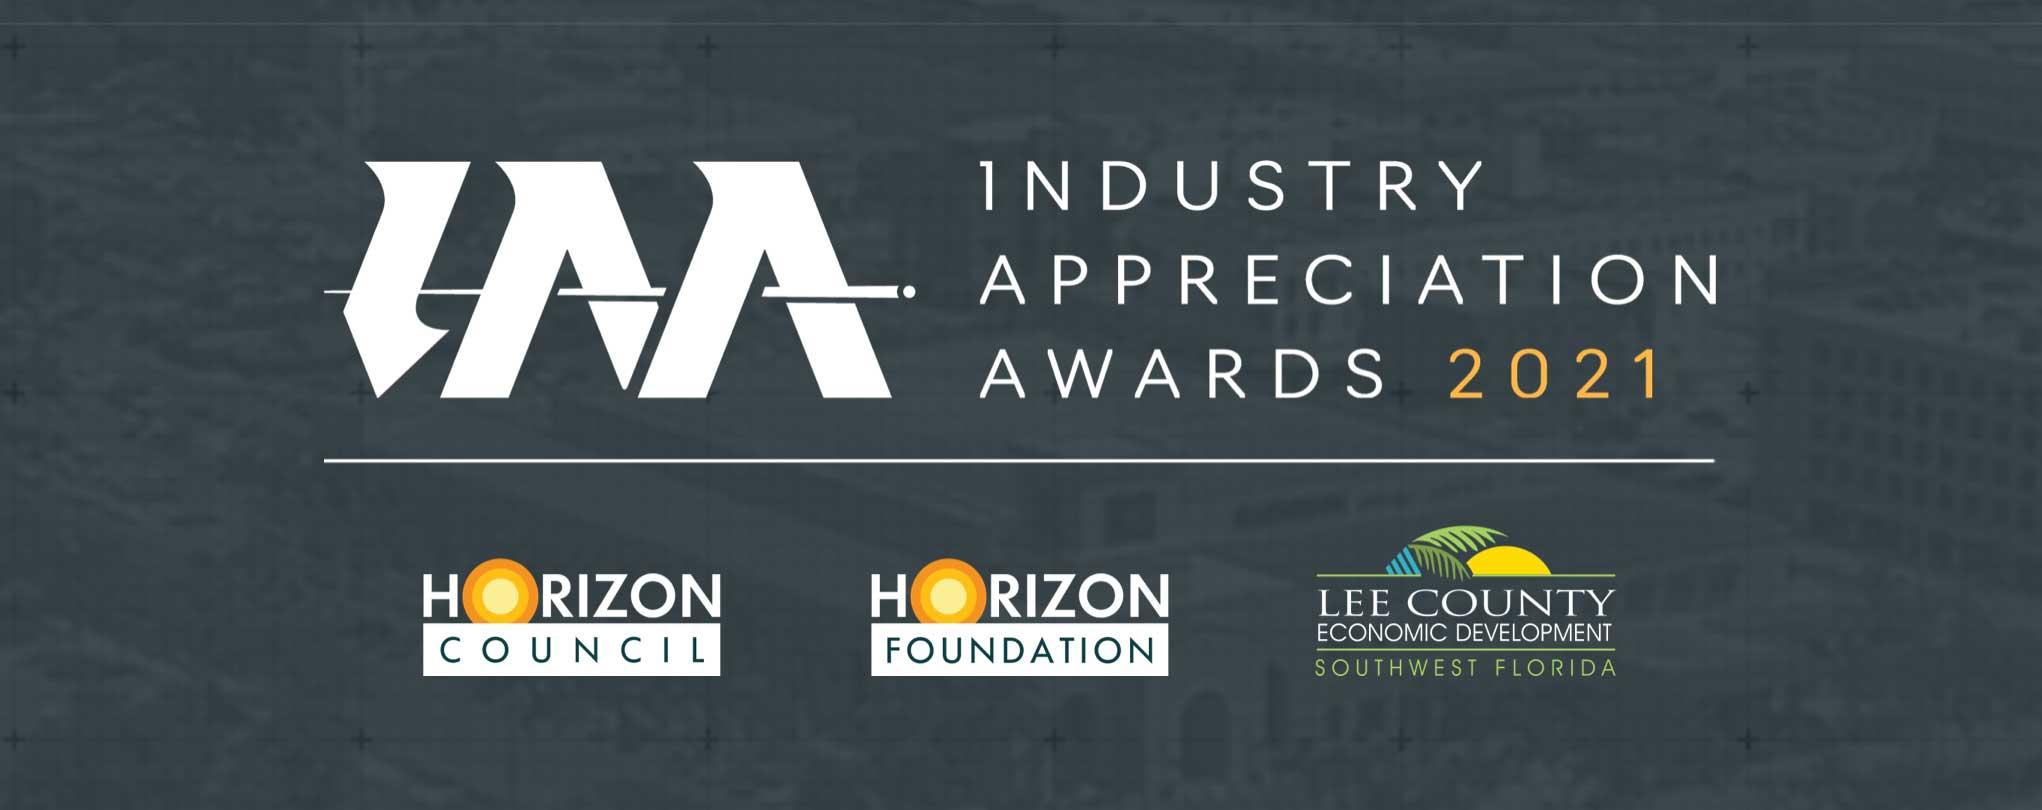 2021 Industry Appreciation Awards Innovator of the Year Finalist